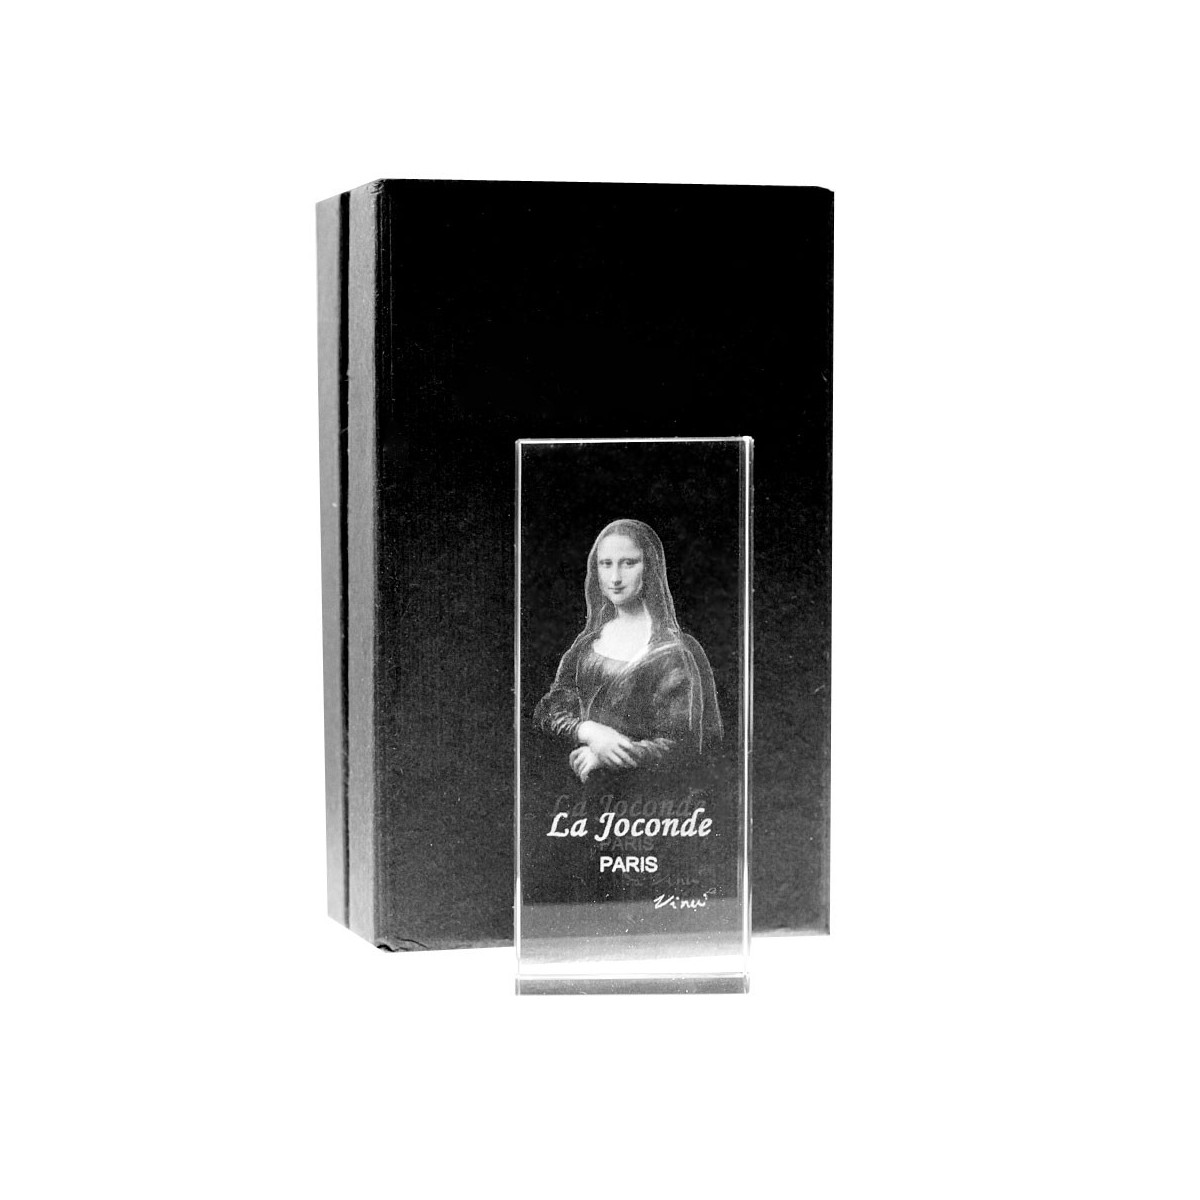 Presse papier la Joconde de Léonard de Vinci